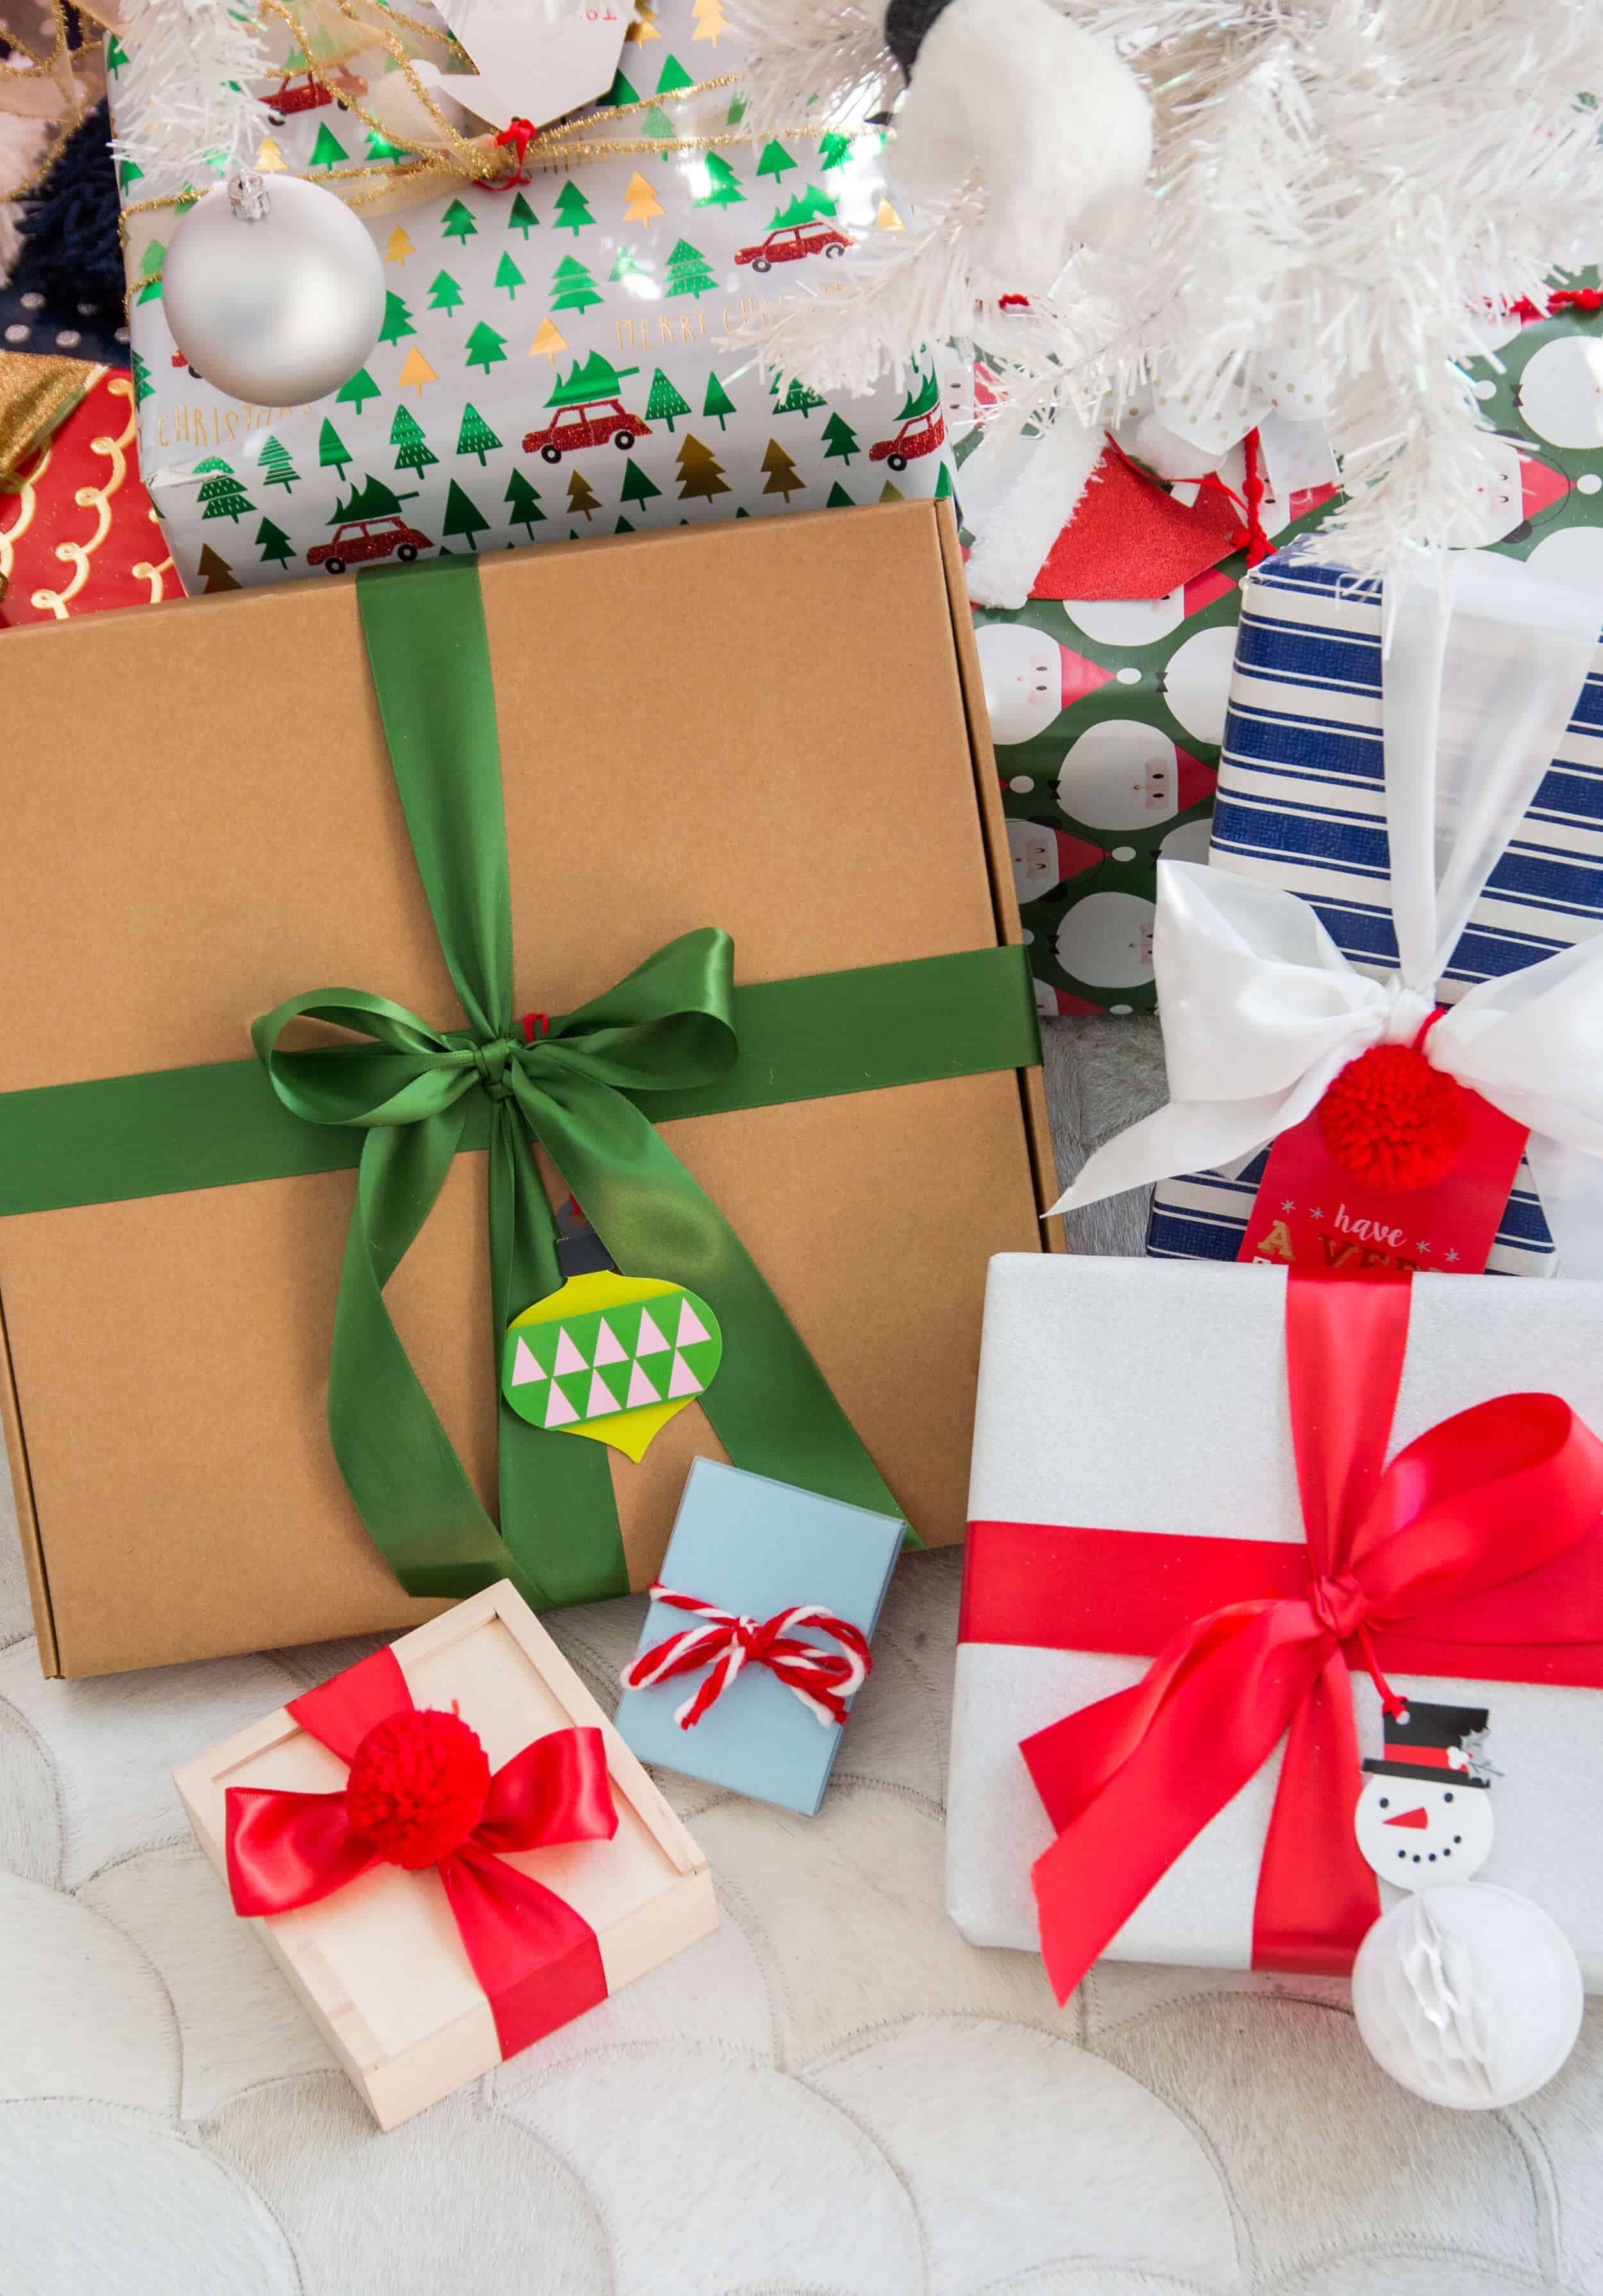 emily-henderson_mpix_custom-gifts_digital-book_printing_gifts_christmas_holiday_18